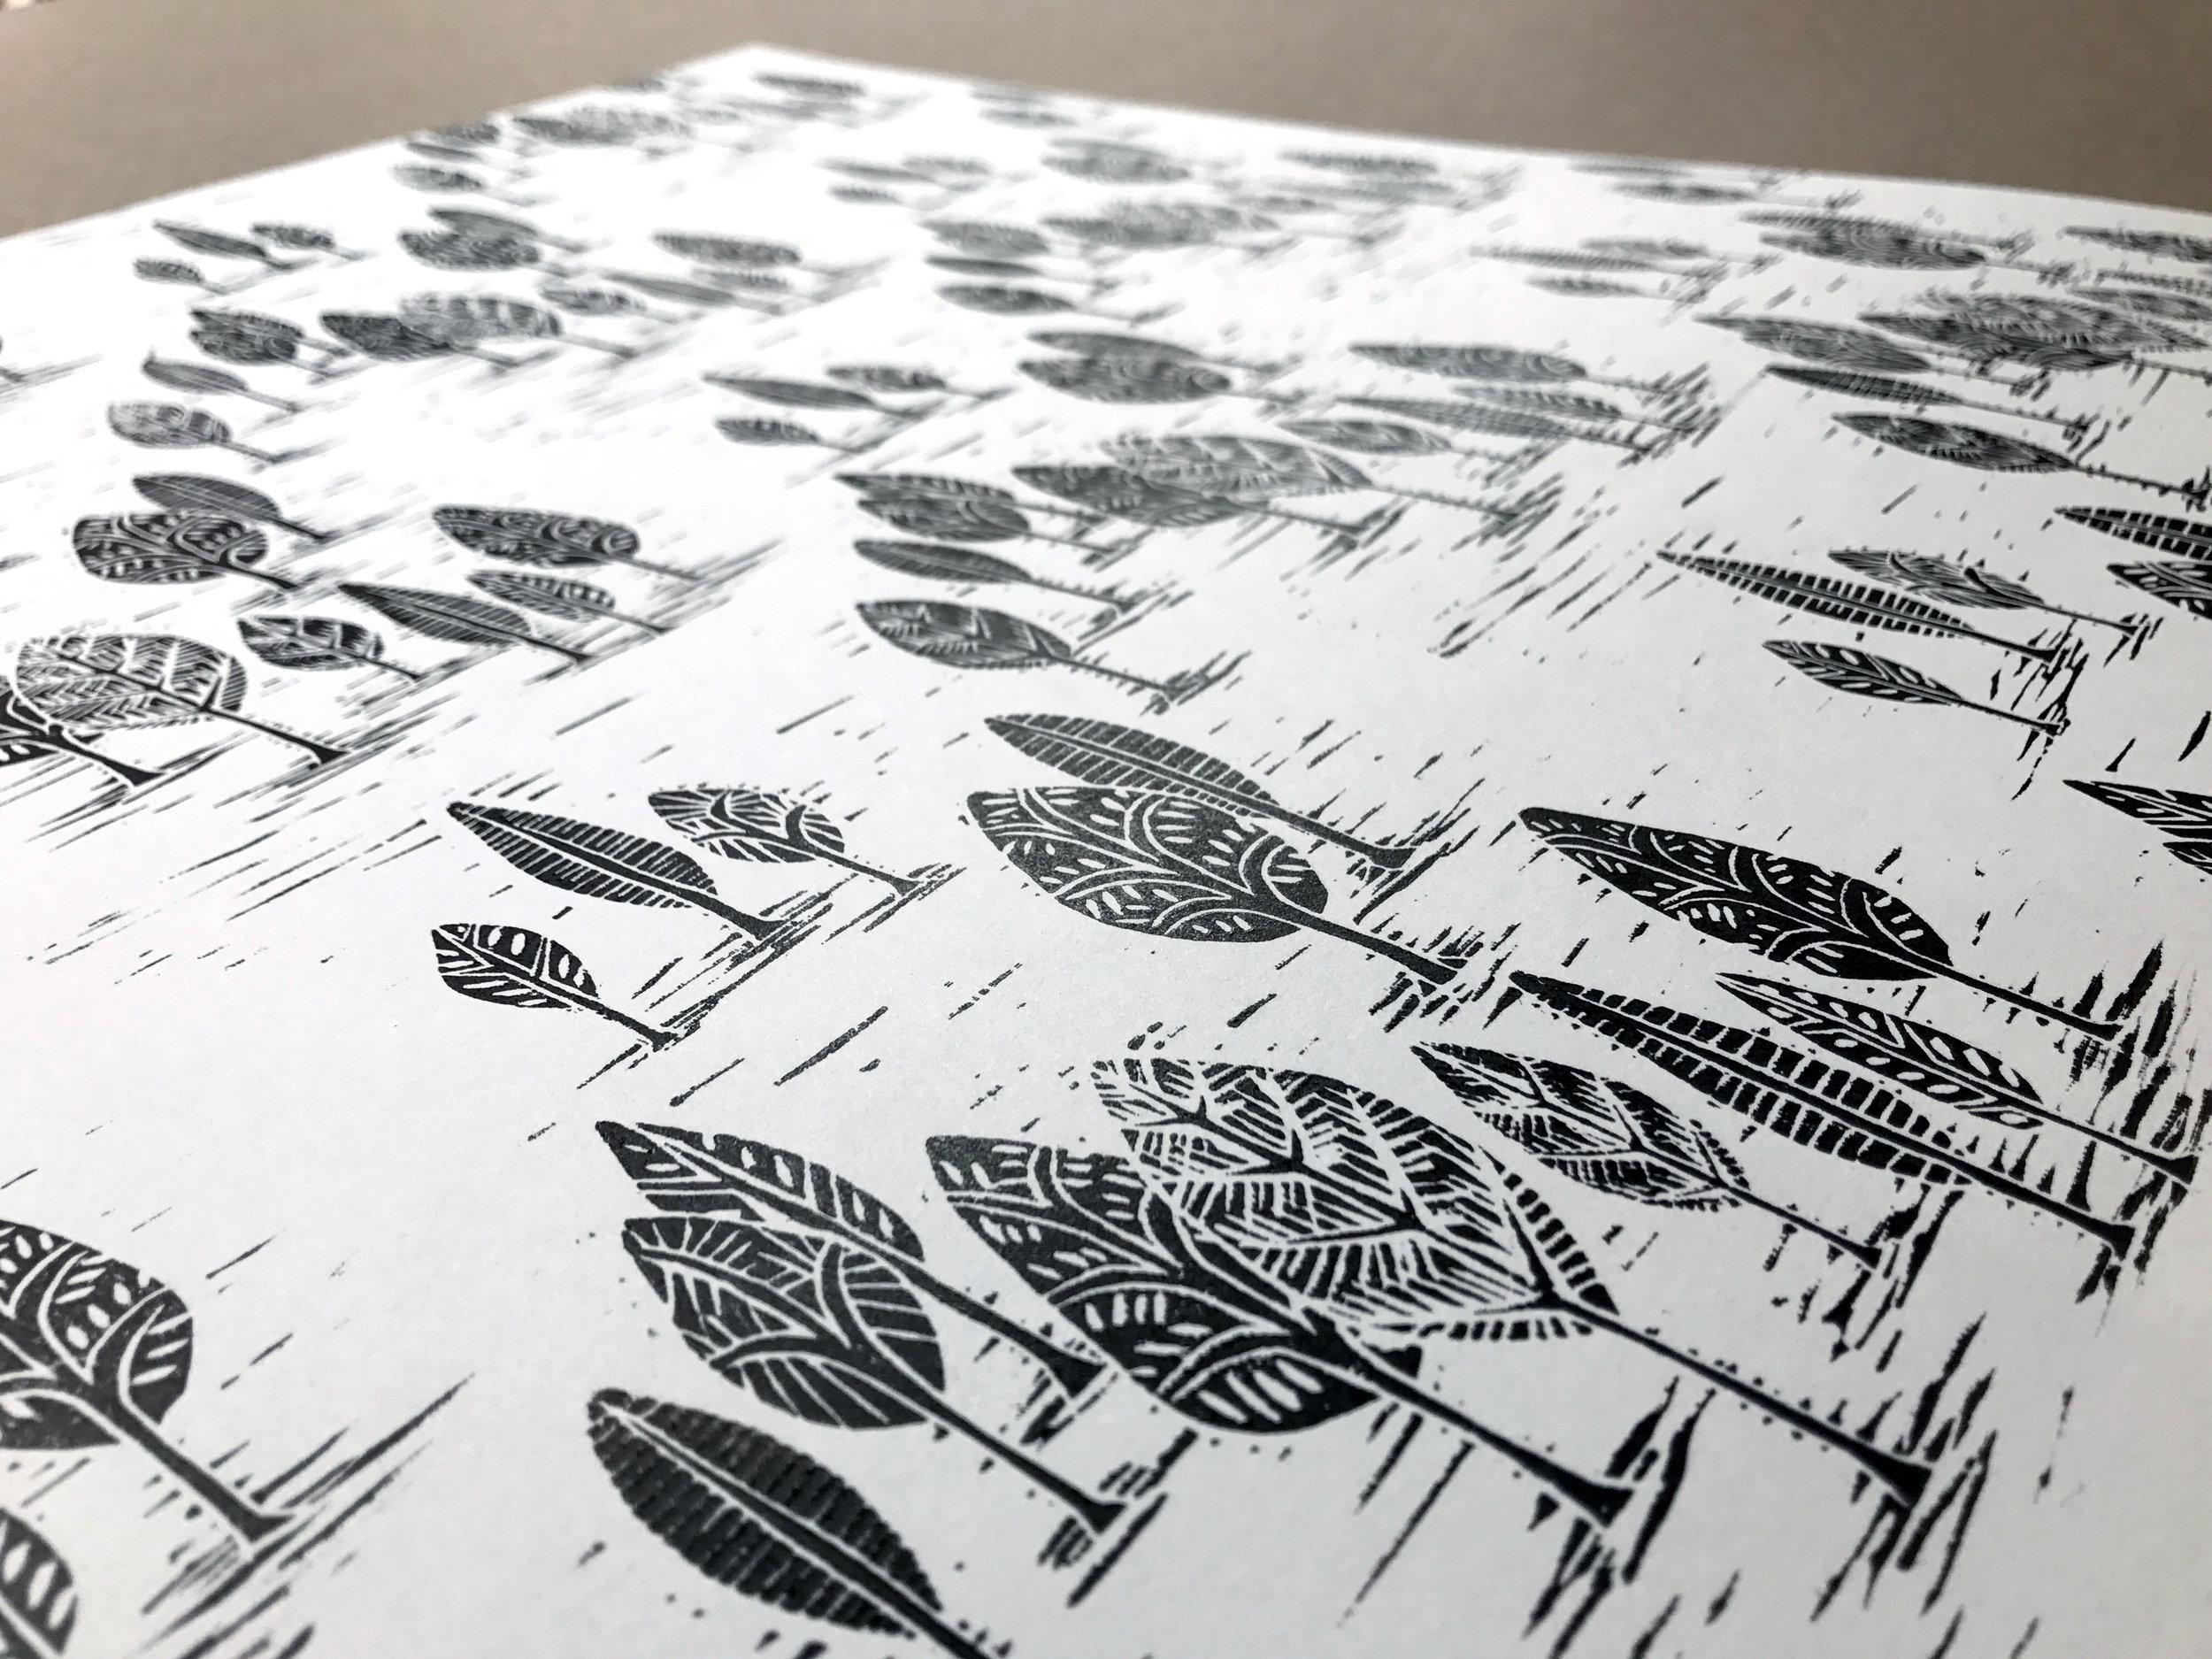 Pattern_in the trees_detail.JPG